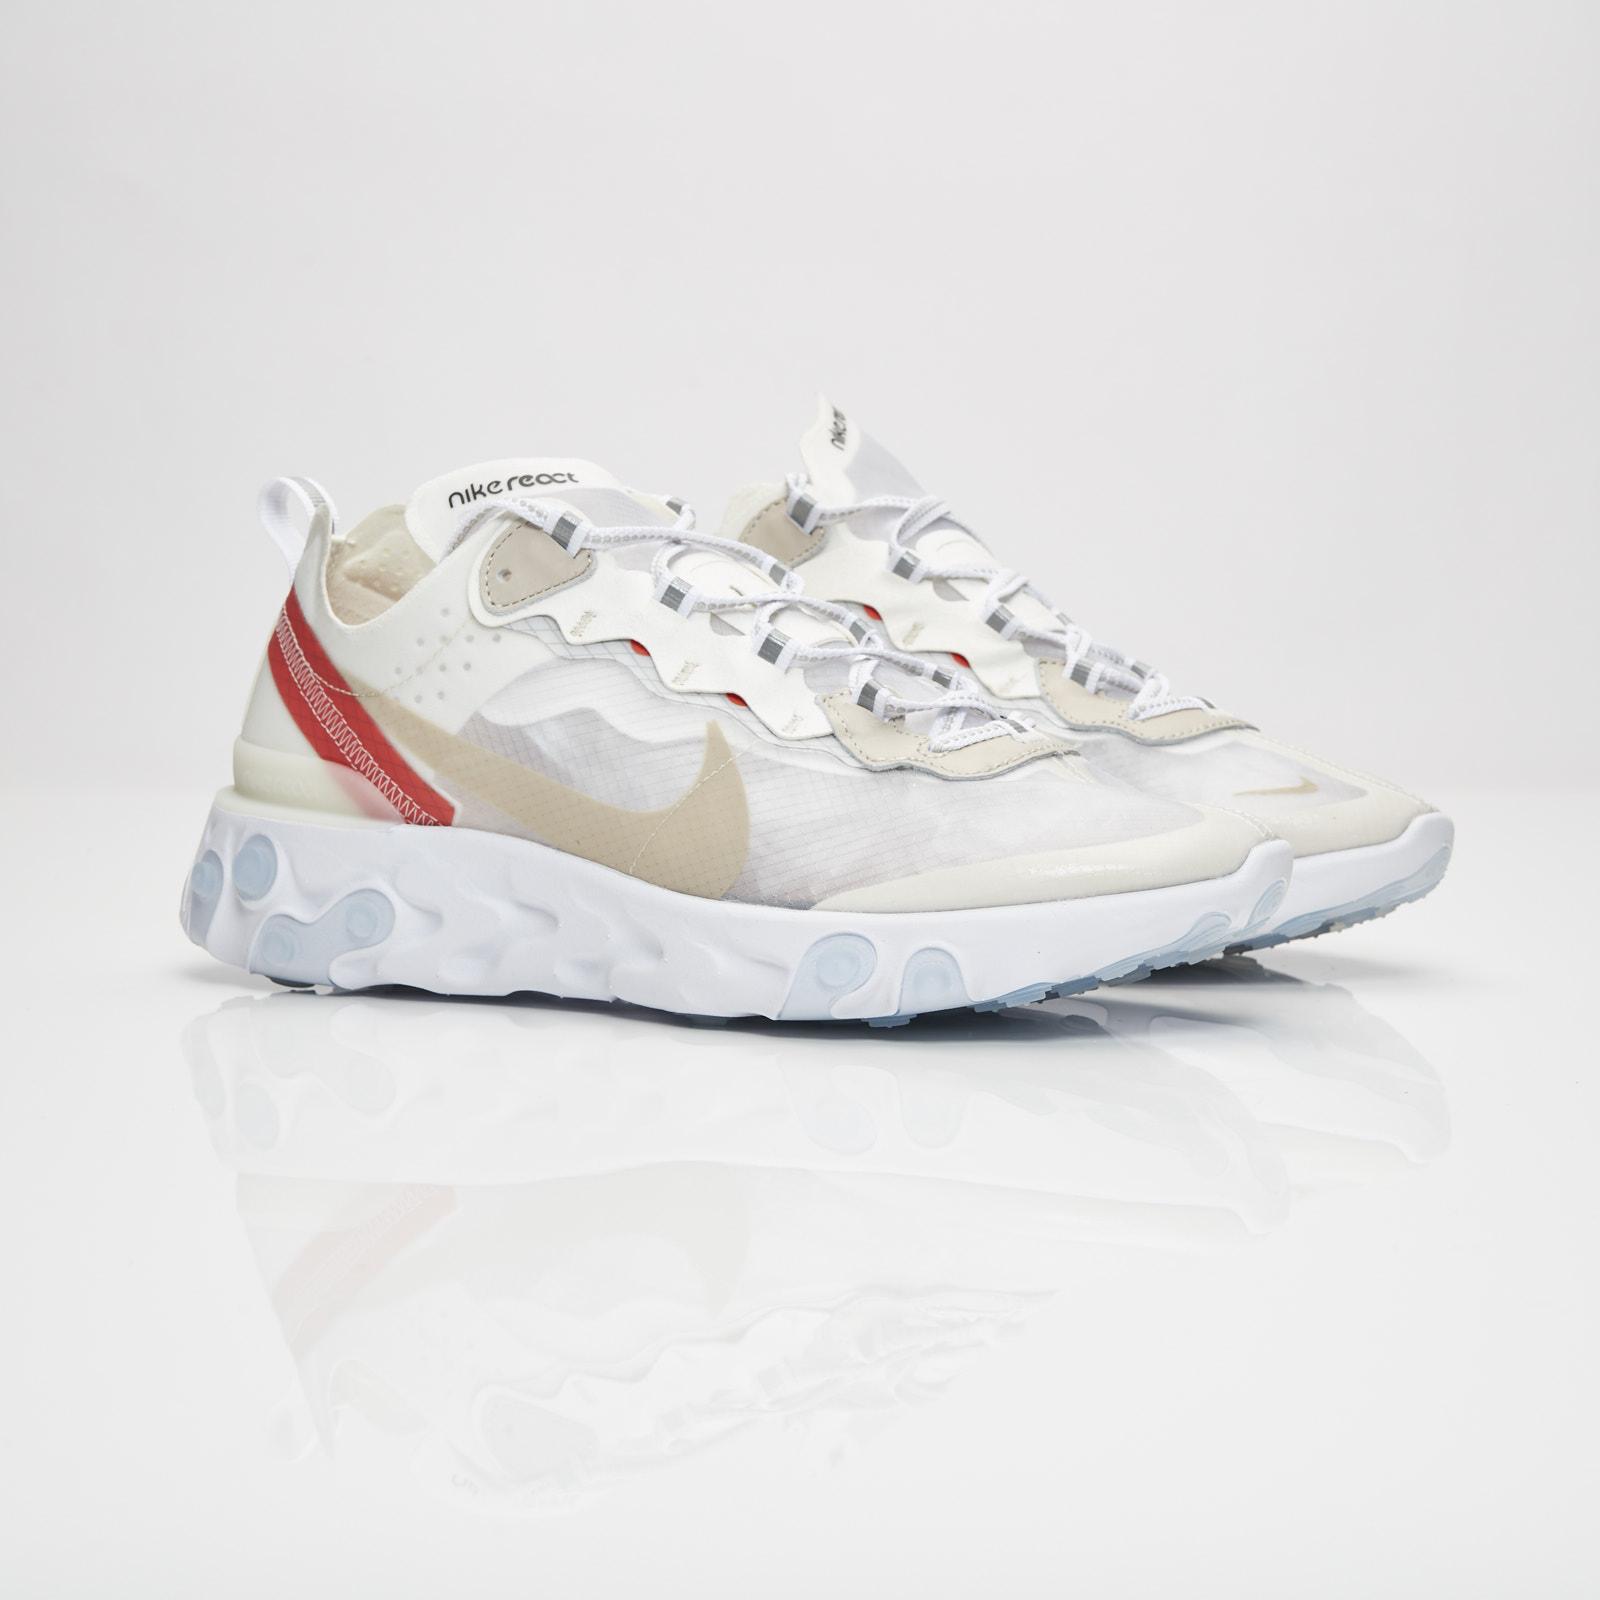 39f1a7fe3a59 Nike React Element 87 - Aq1090-100 - Sneakersnstuff